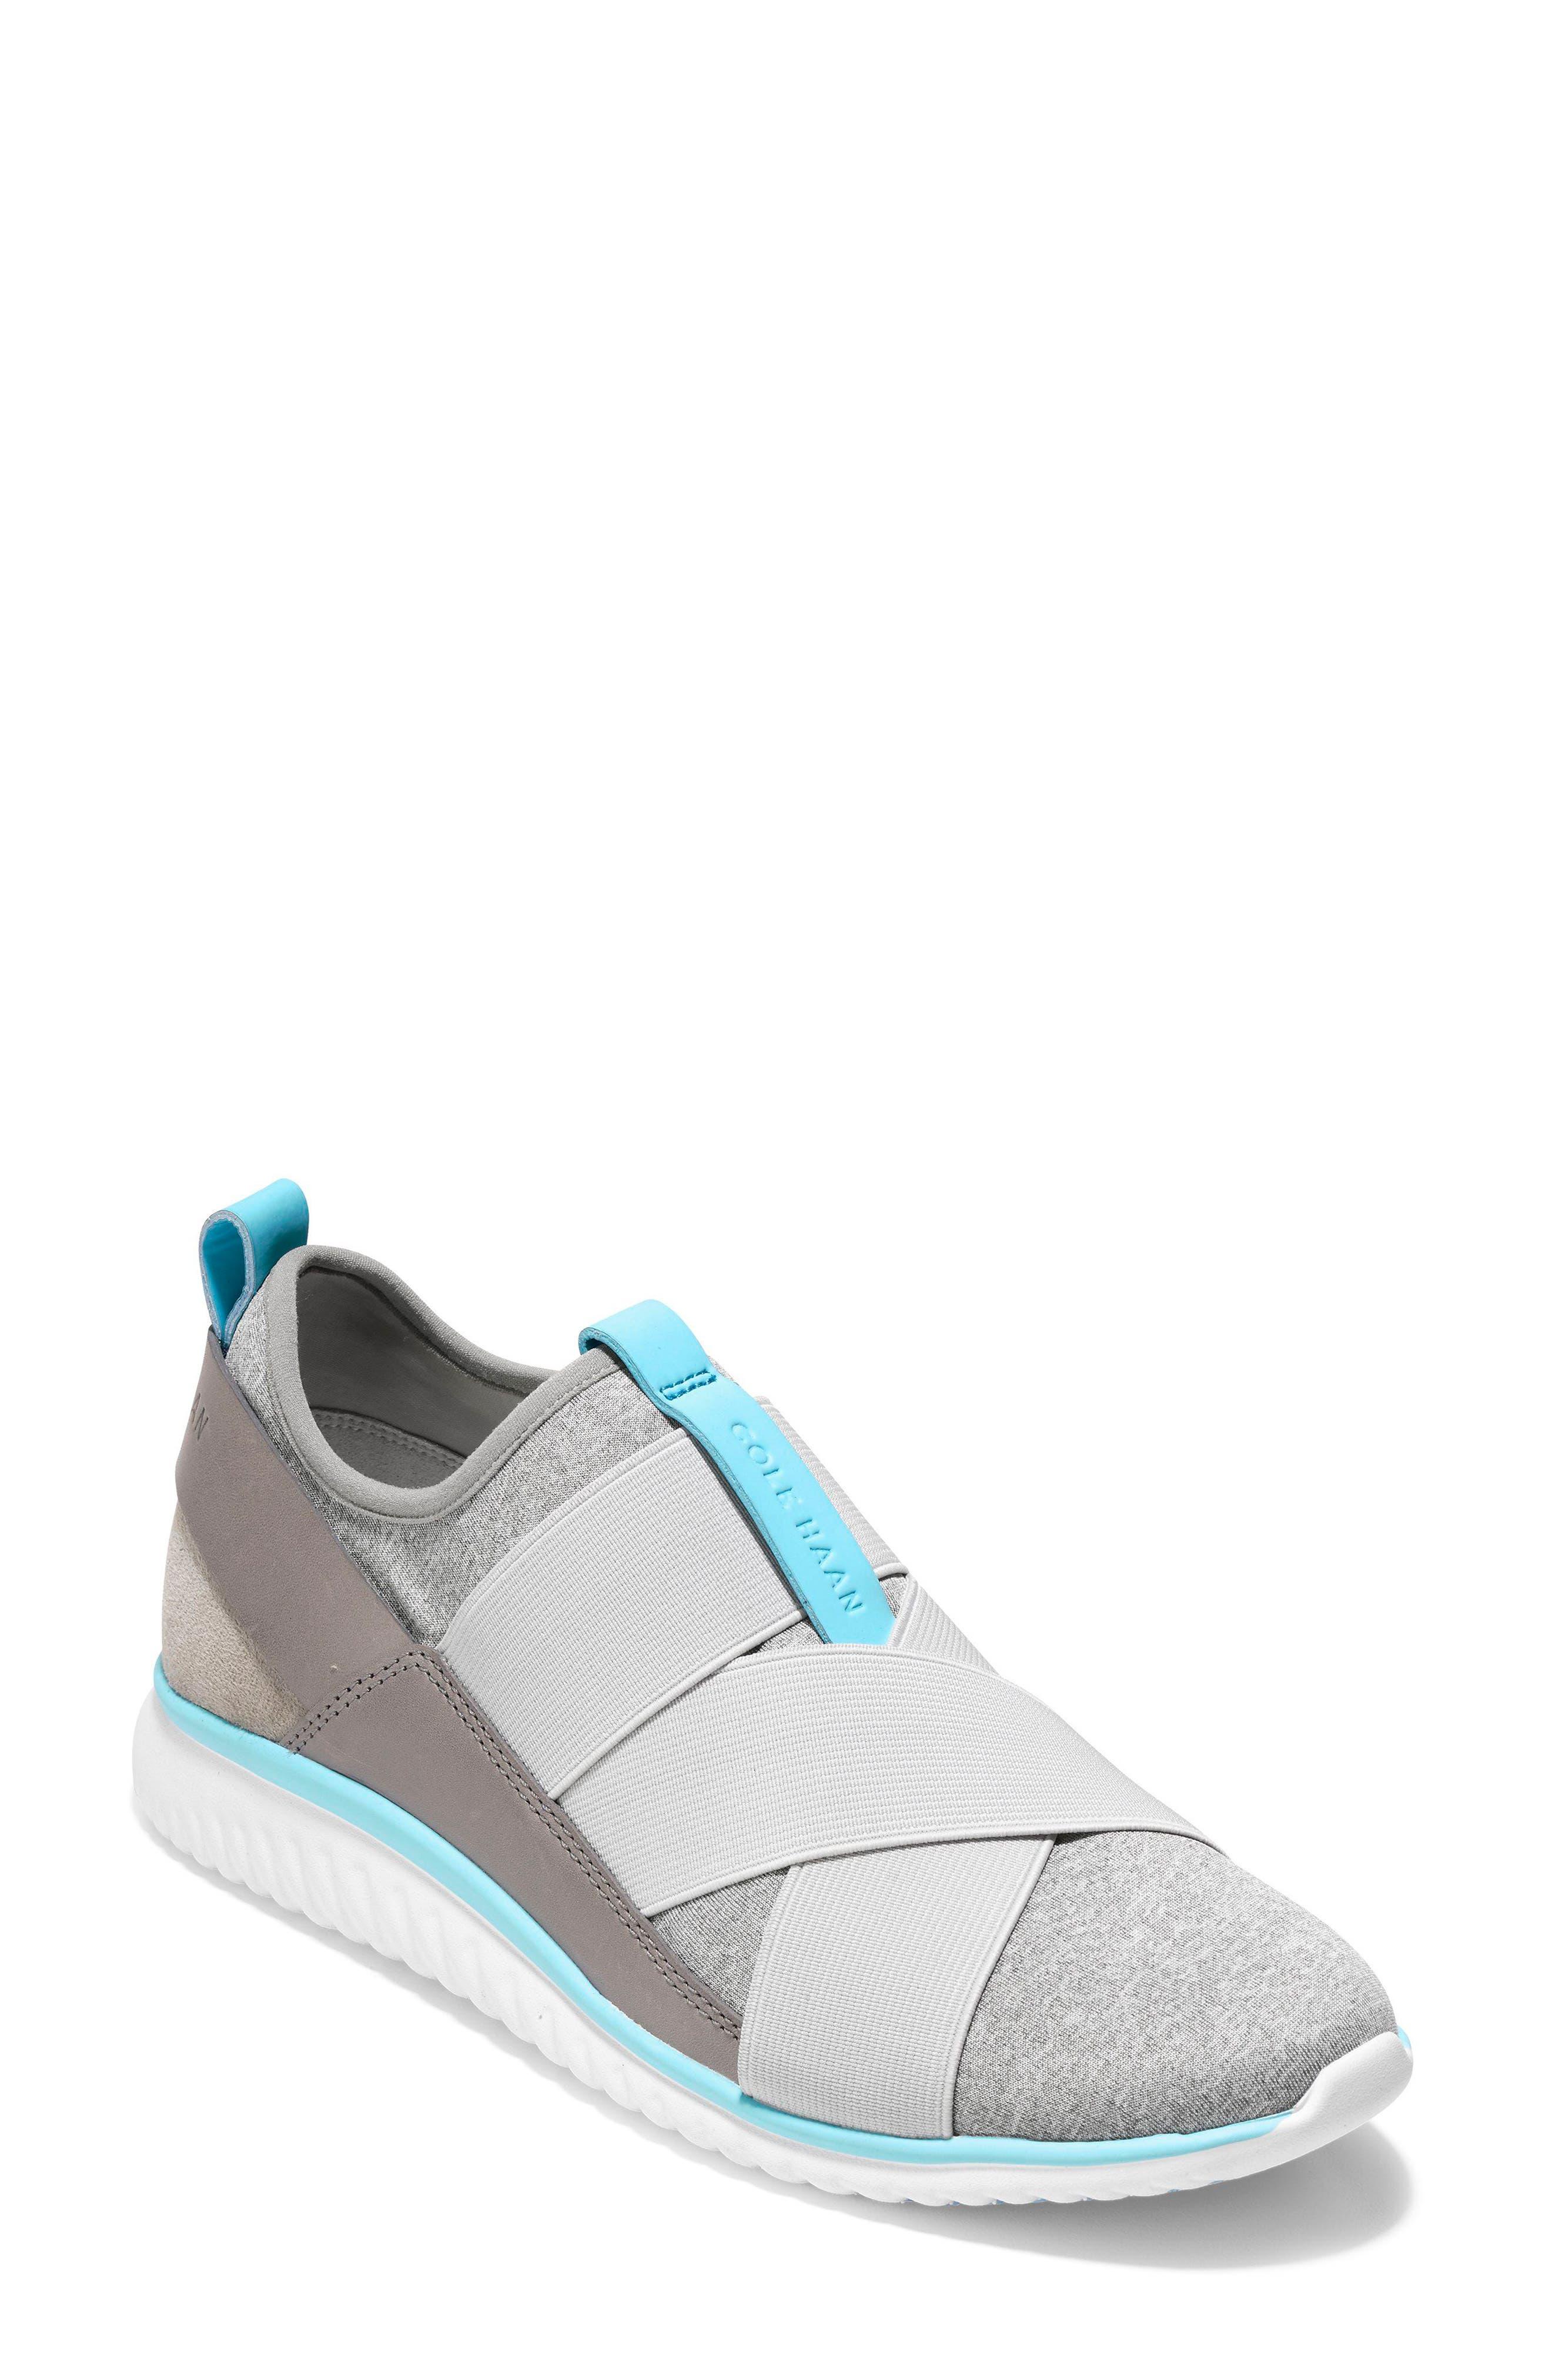 'StudioGrand' Sneaker,                             Main thumbnail 1, color,                             Grey Fabric